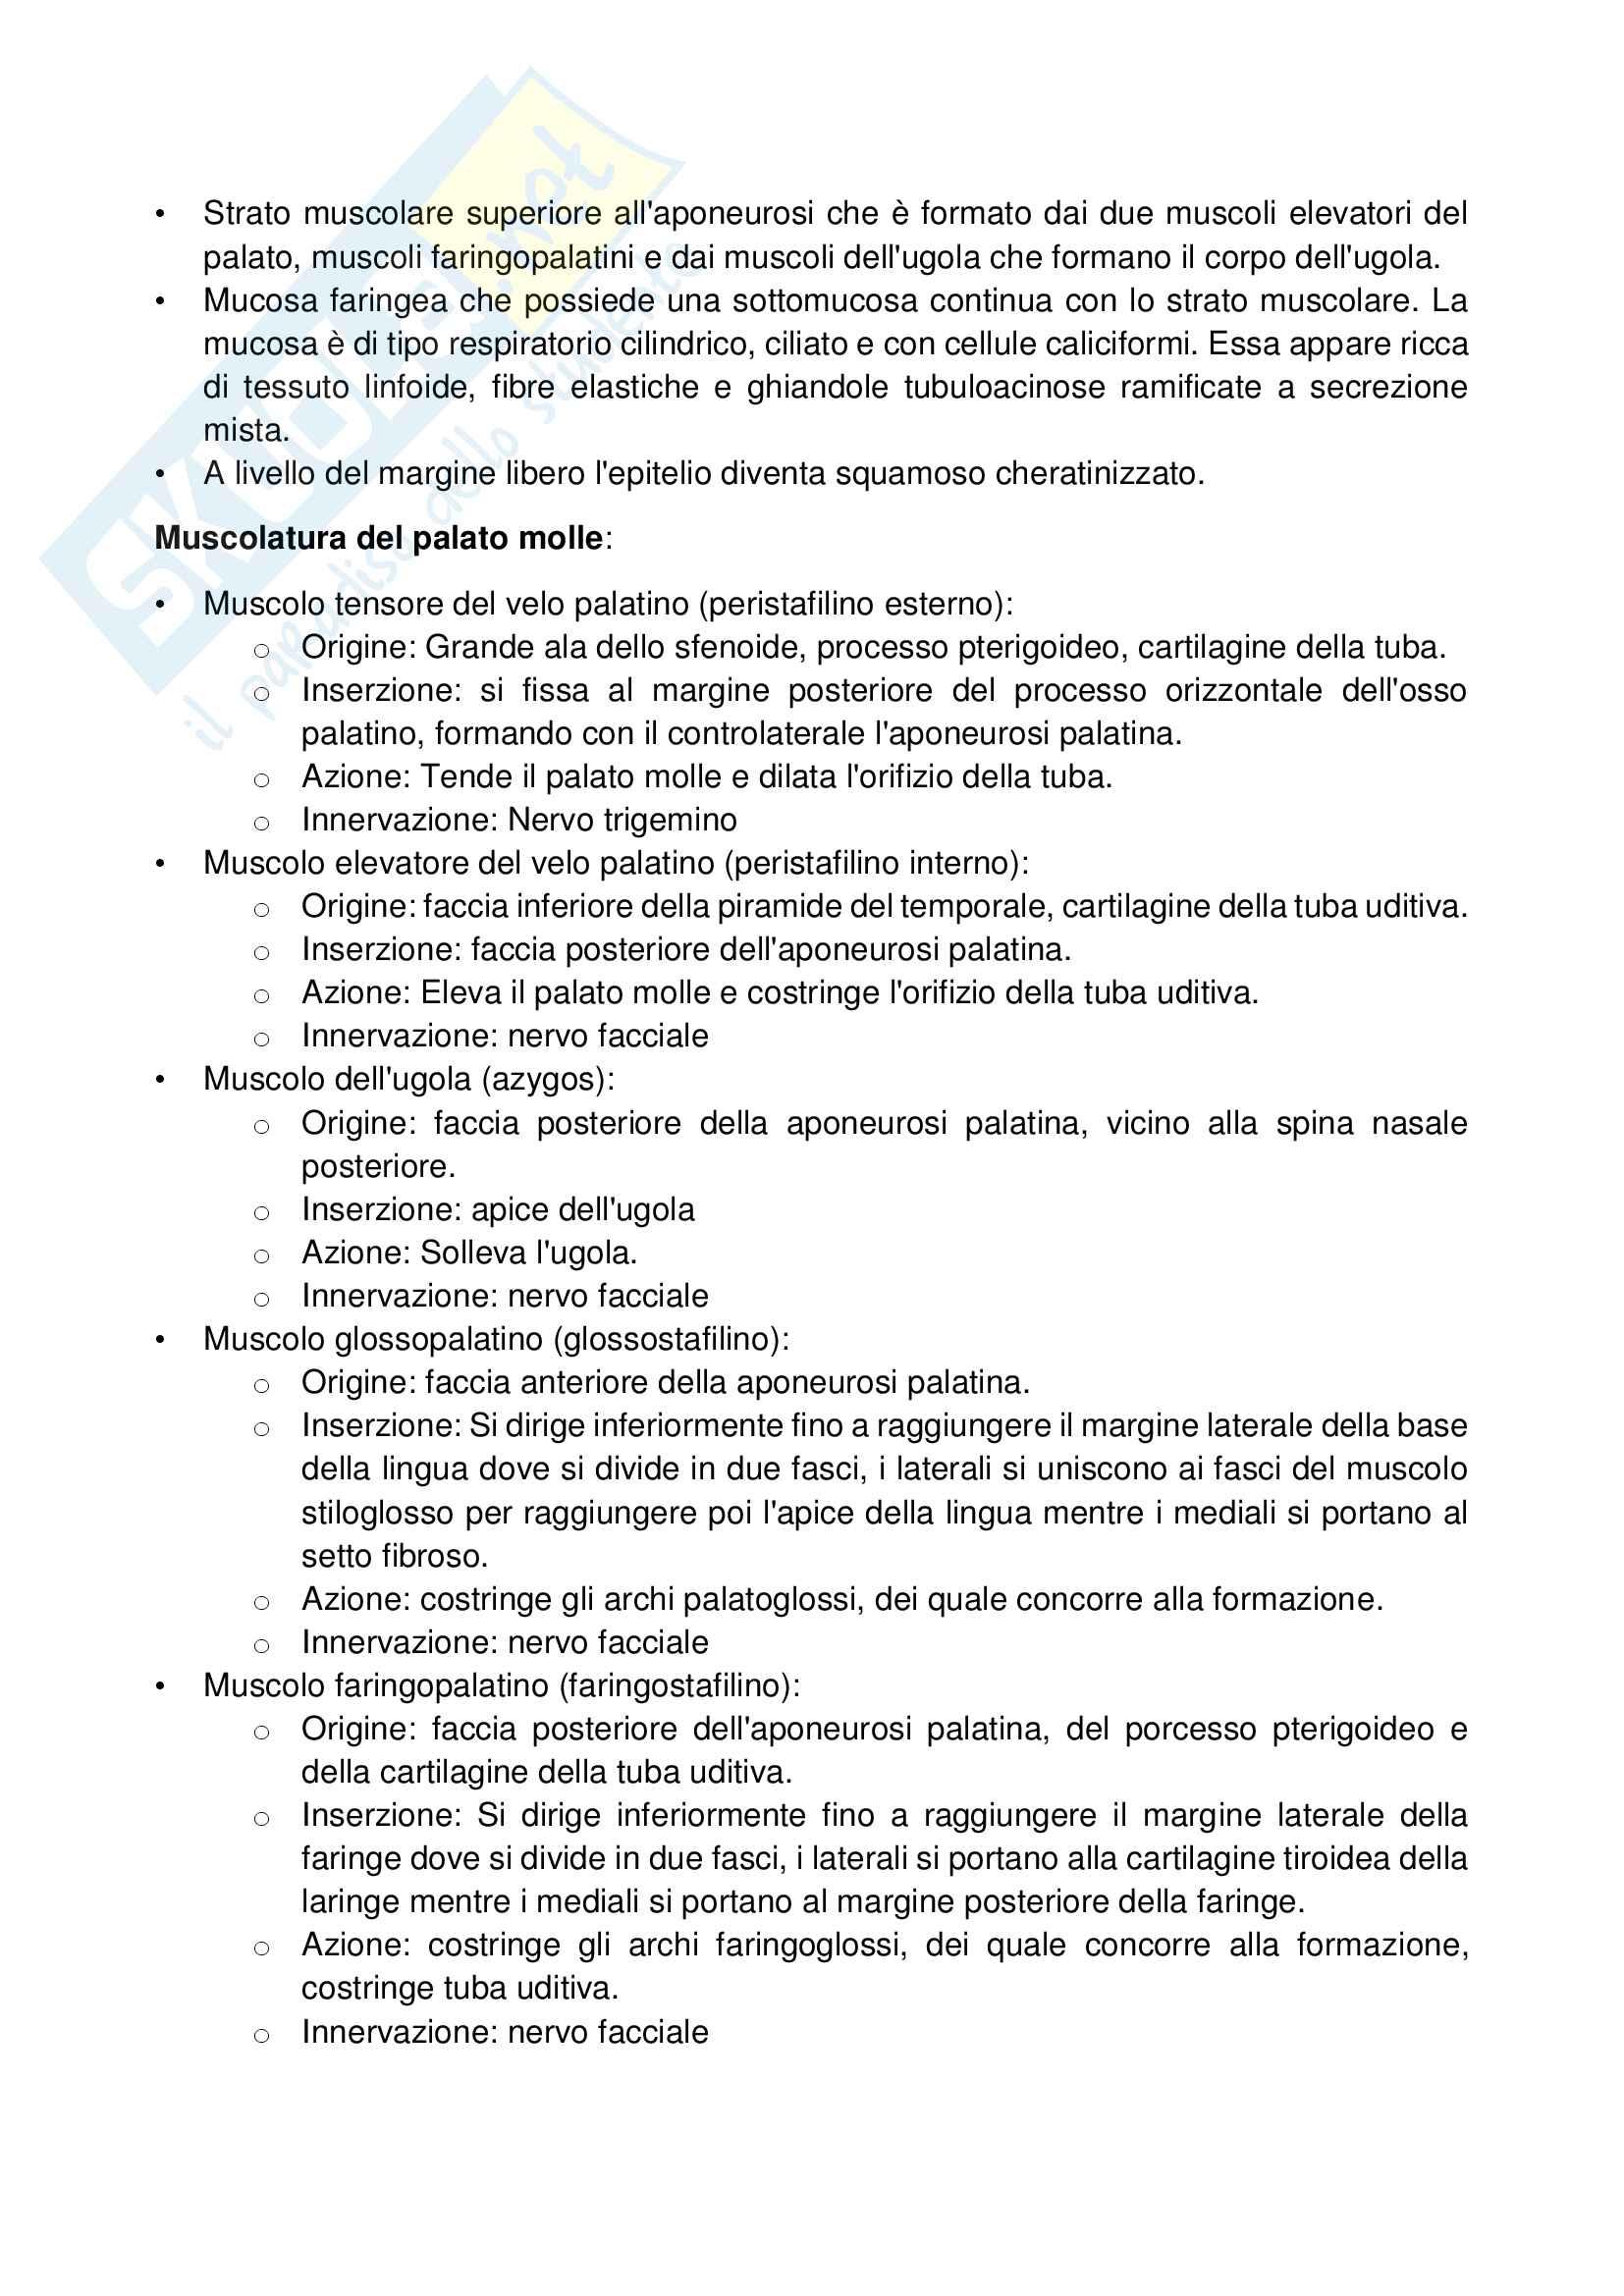 1 anatomia Appararo Digerente Cavo Orale Pag. 11